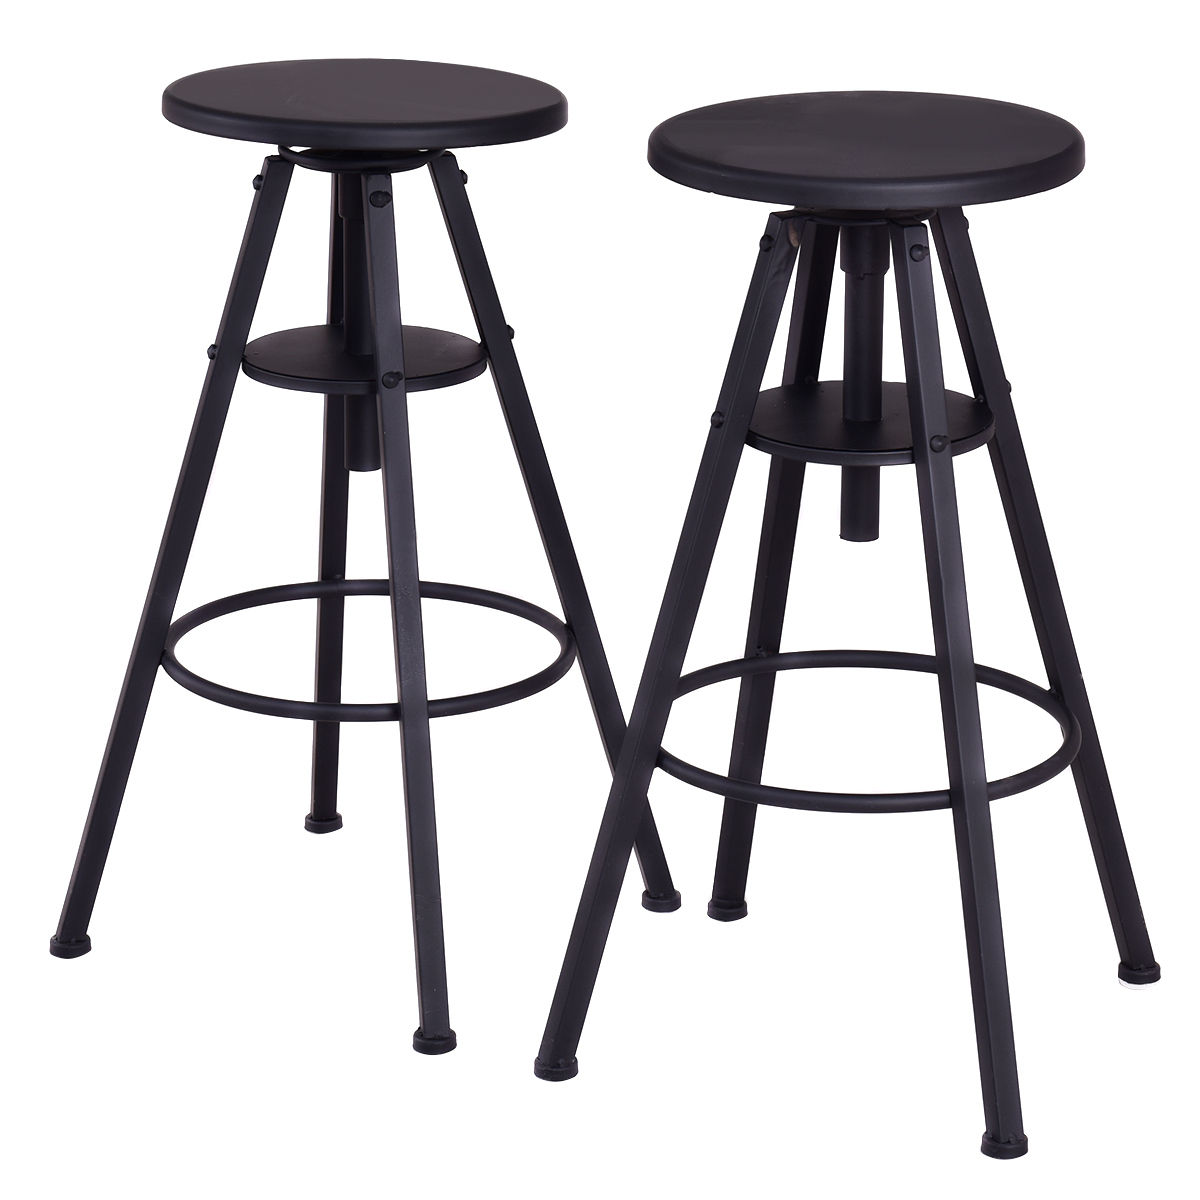 Costway Set of 2 Vintage Bar Stools Height Adjustable Metal Pub Chairs Black by Costway